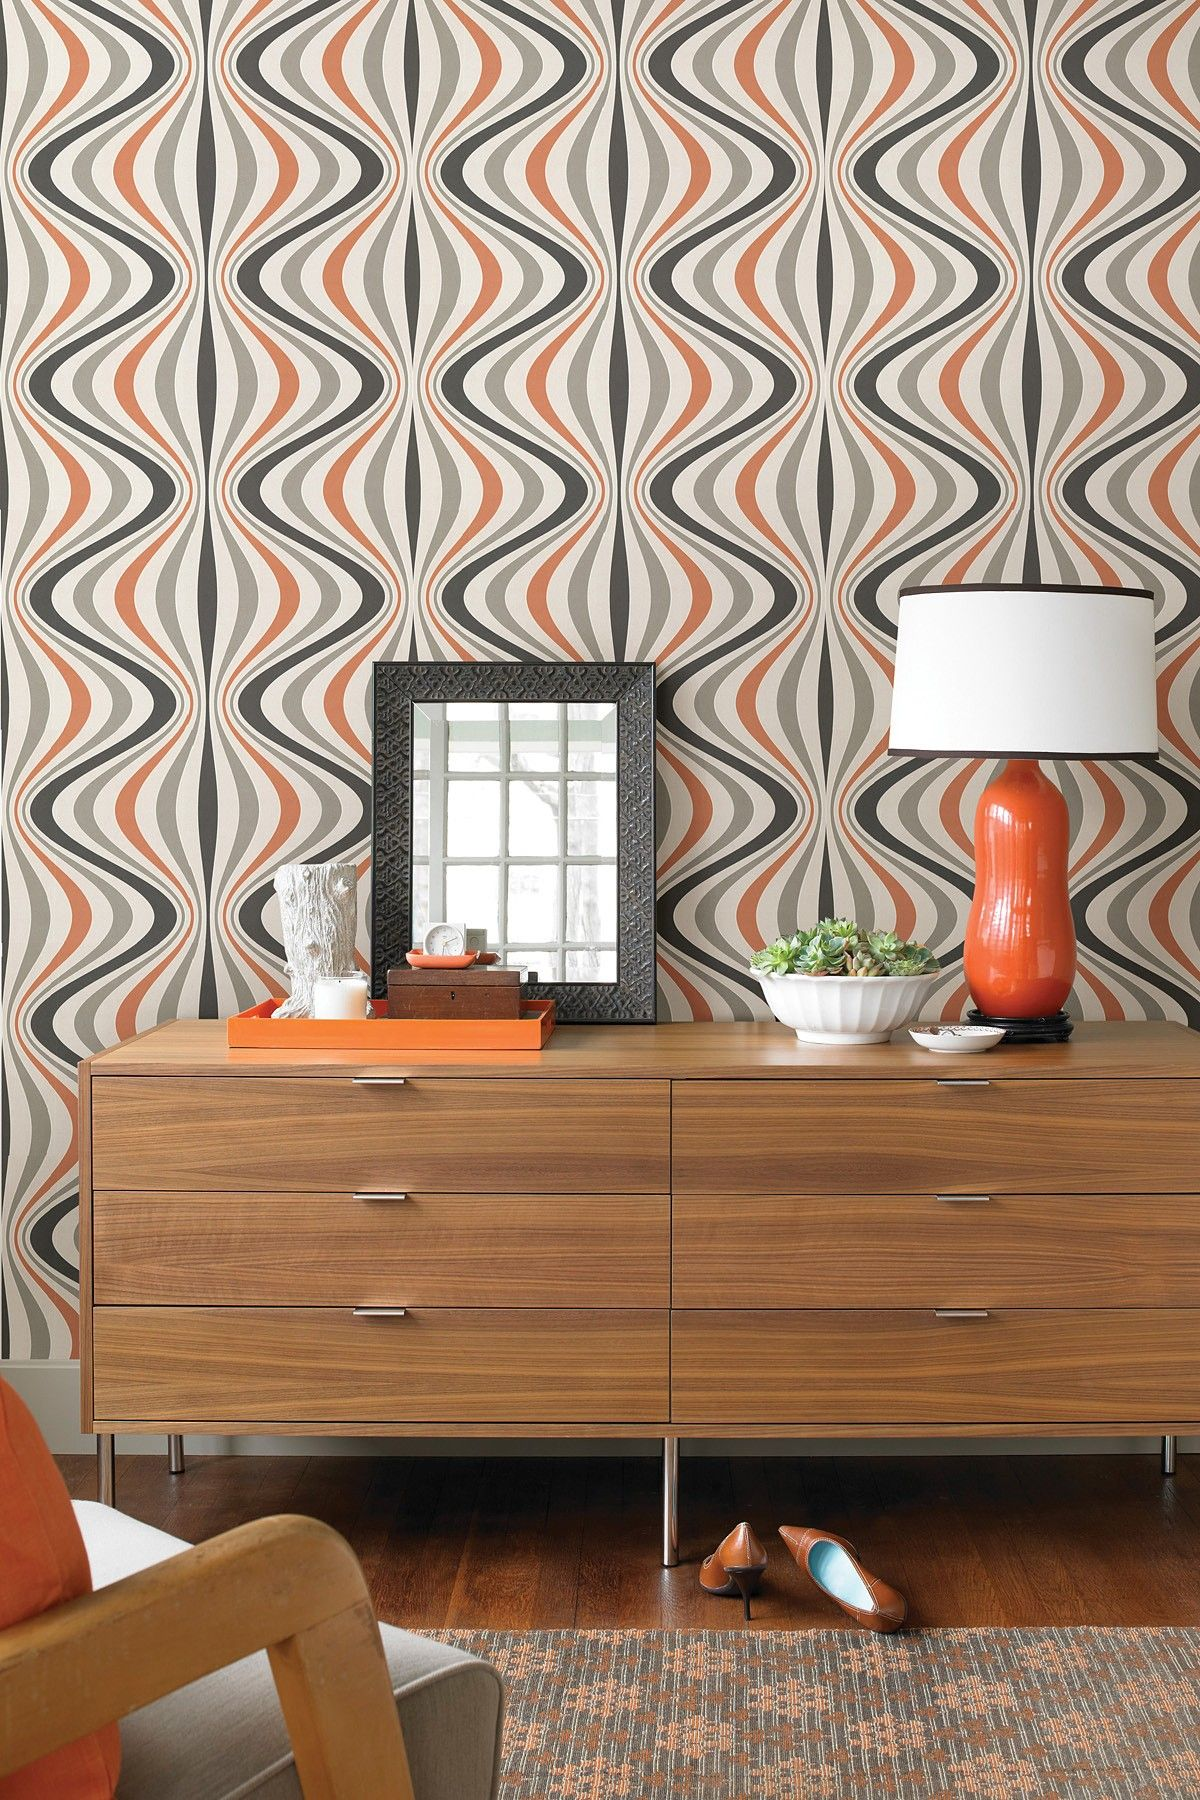 Hendrix orange gravure ogee wallpaper on hautelook pattern pinterest